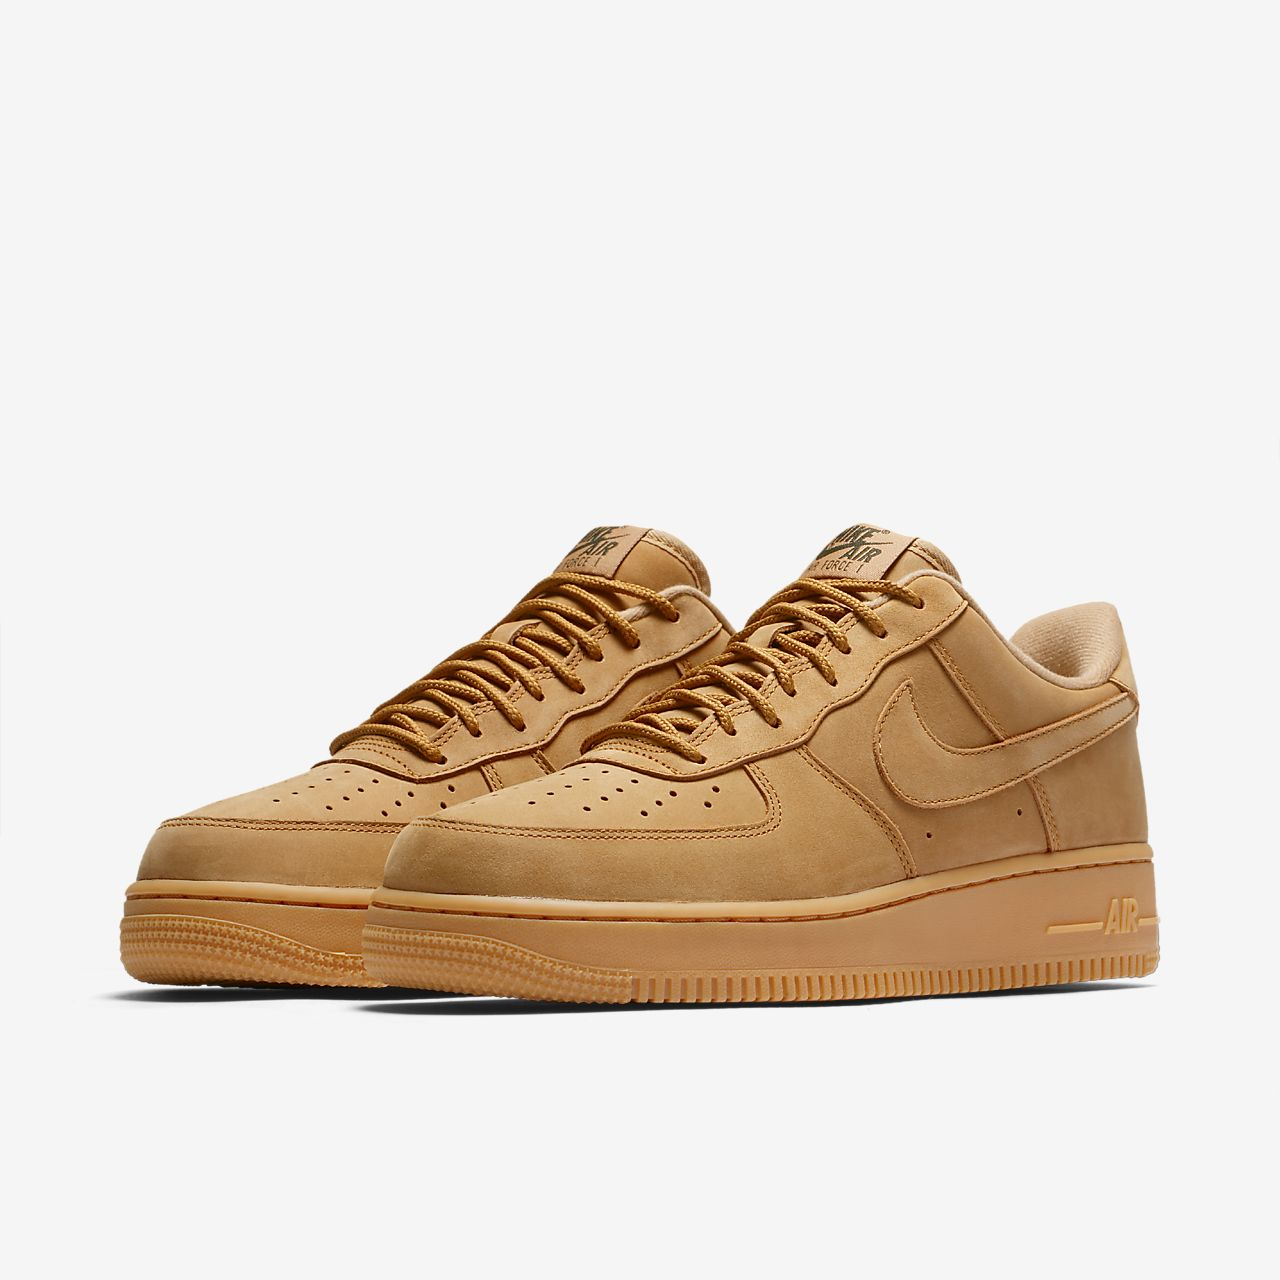 separation shoes 61130 4a264 ... Nike Air Force 1  07 WB Men s Shoe